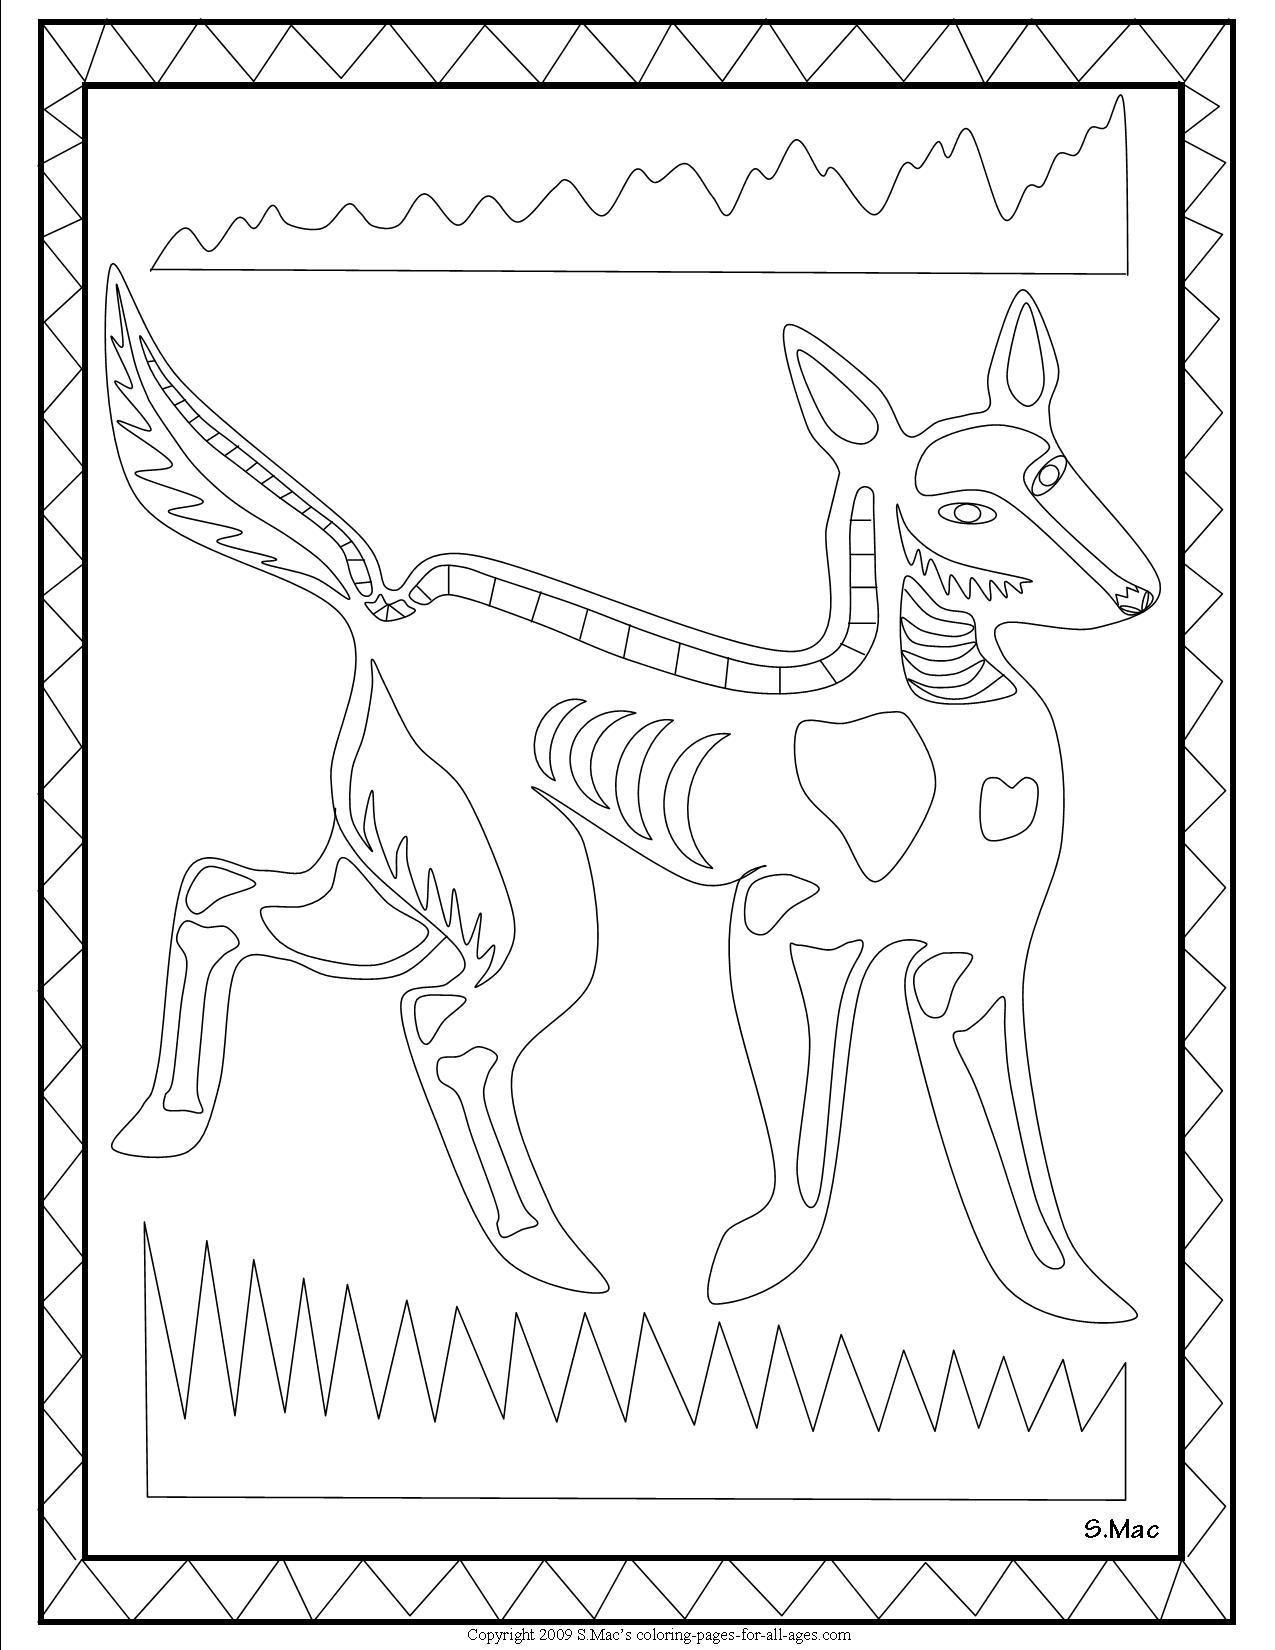 Scs x ray art dingo coloring page aboriginal dot painting scs x ray art dingo coloring page biocorpaavc Images